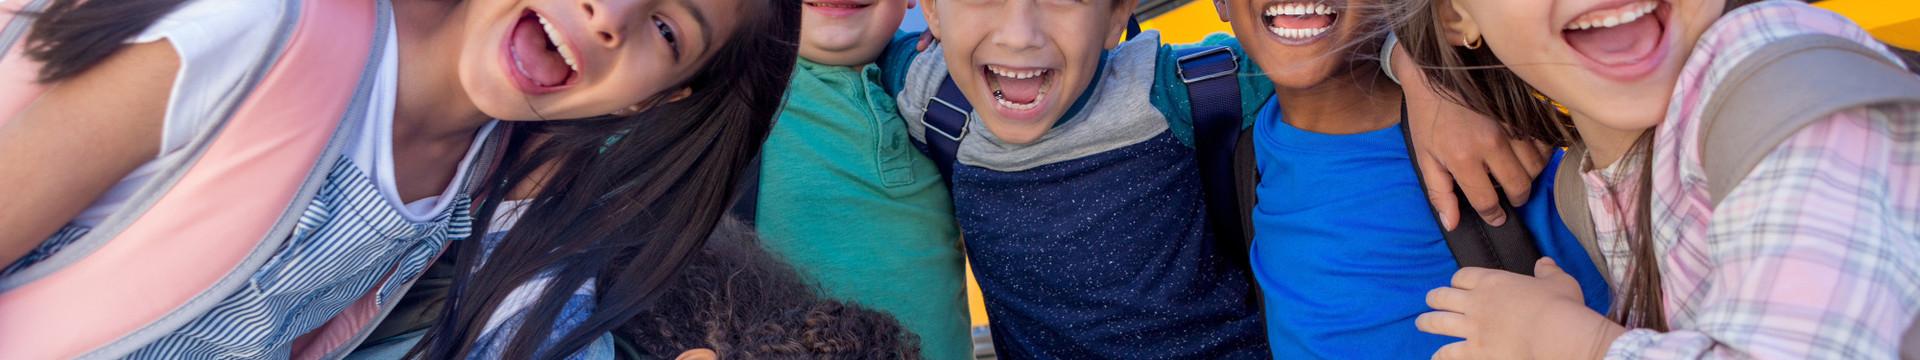 School Trip Hotel Rates In NYC | Group of School Children